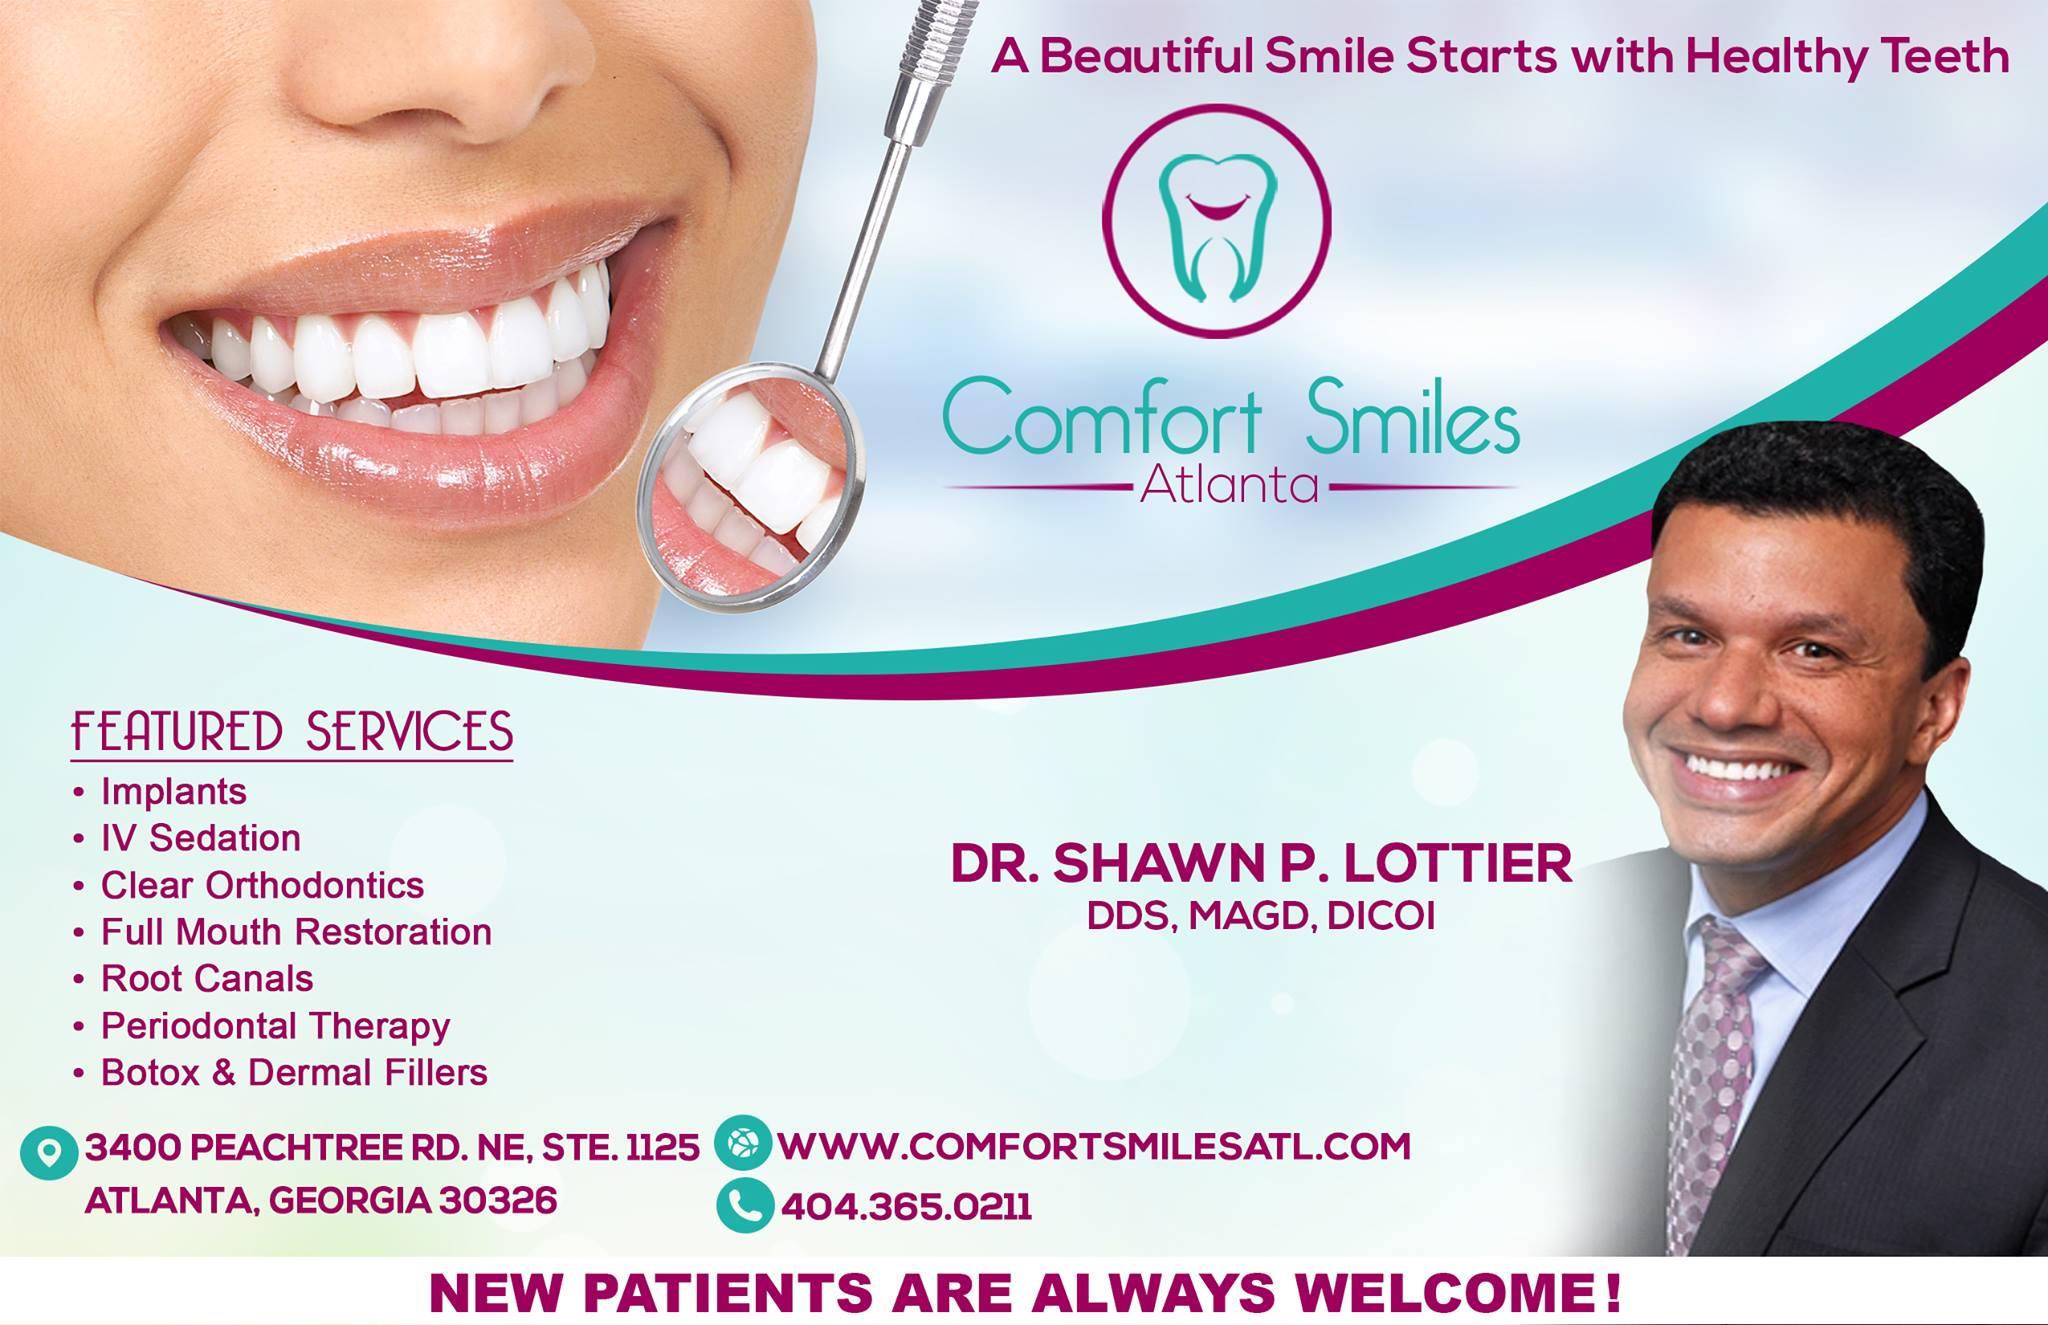 Comfort Smiles Atlanta reviews | Cosmetic Dentists at 3400 Peachtree Rd NE #1125 - Atlanta GA